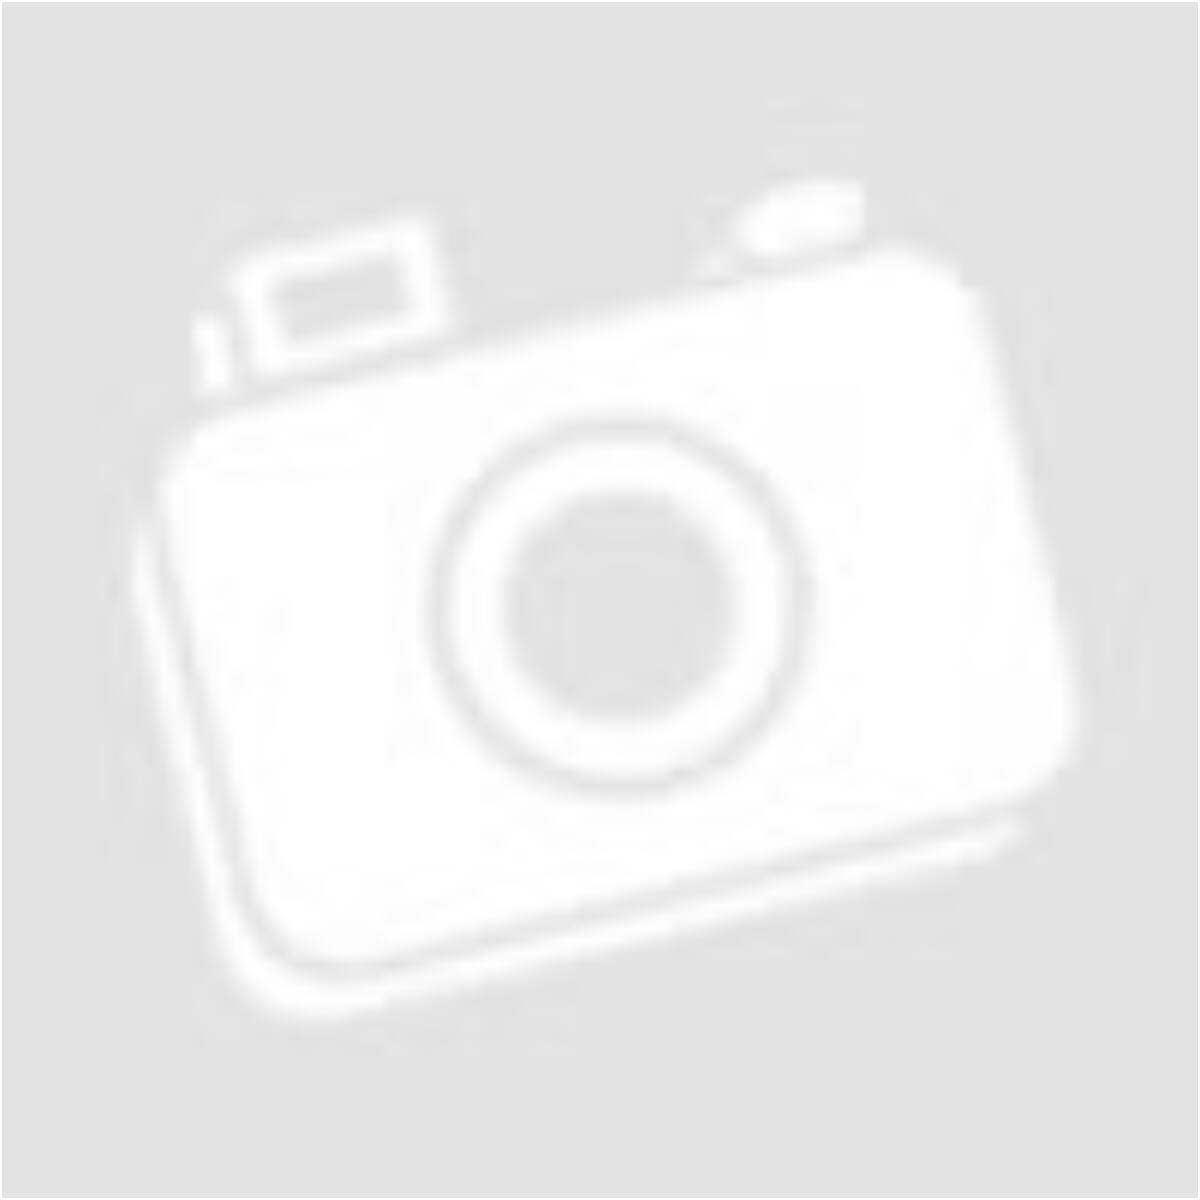 bcb4e81801 Dupla gallérú, karcsúsított ing #1721 - fehér - Modern divatos ingek